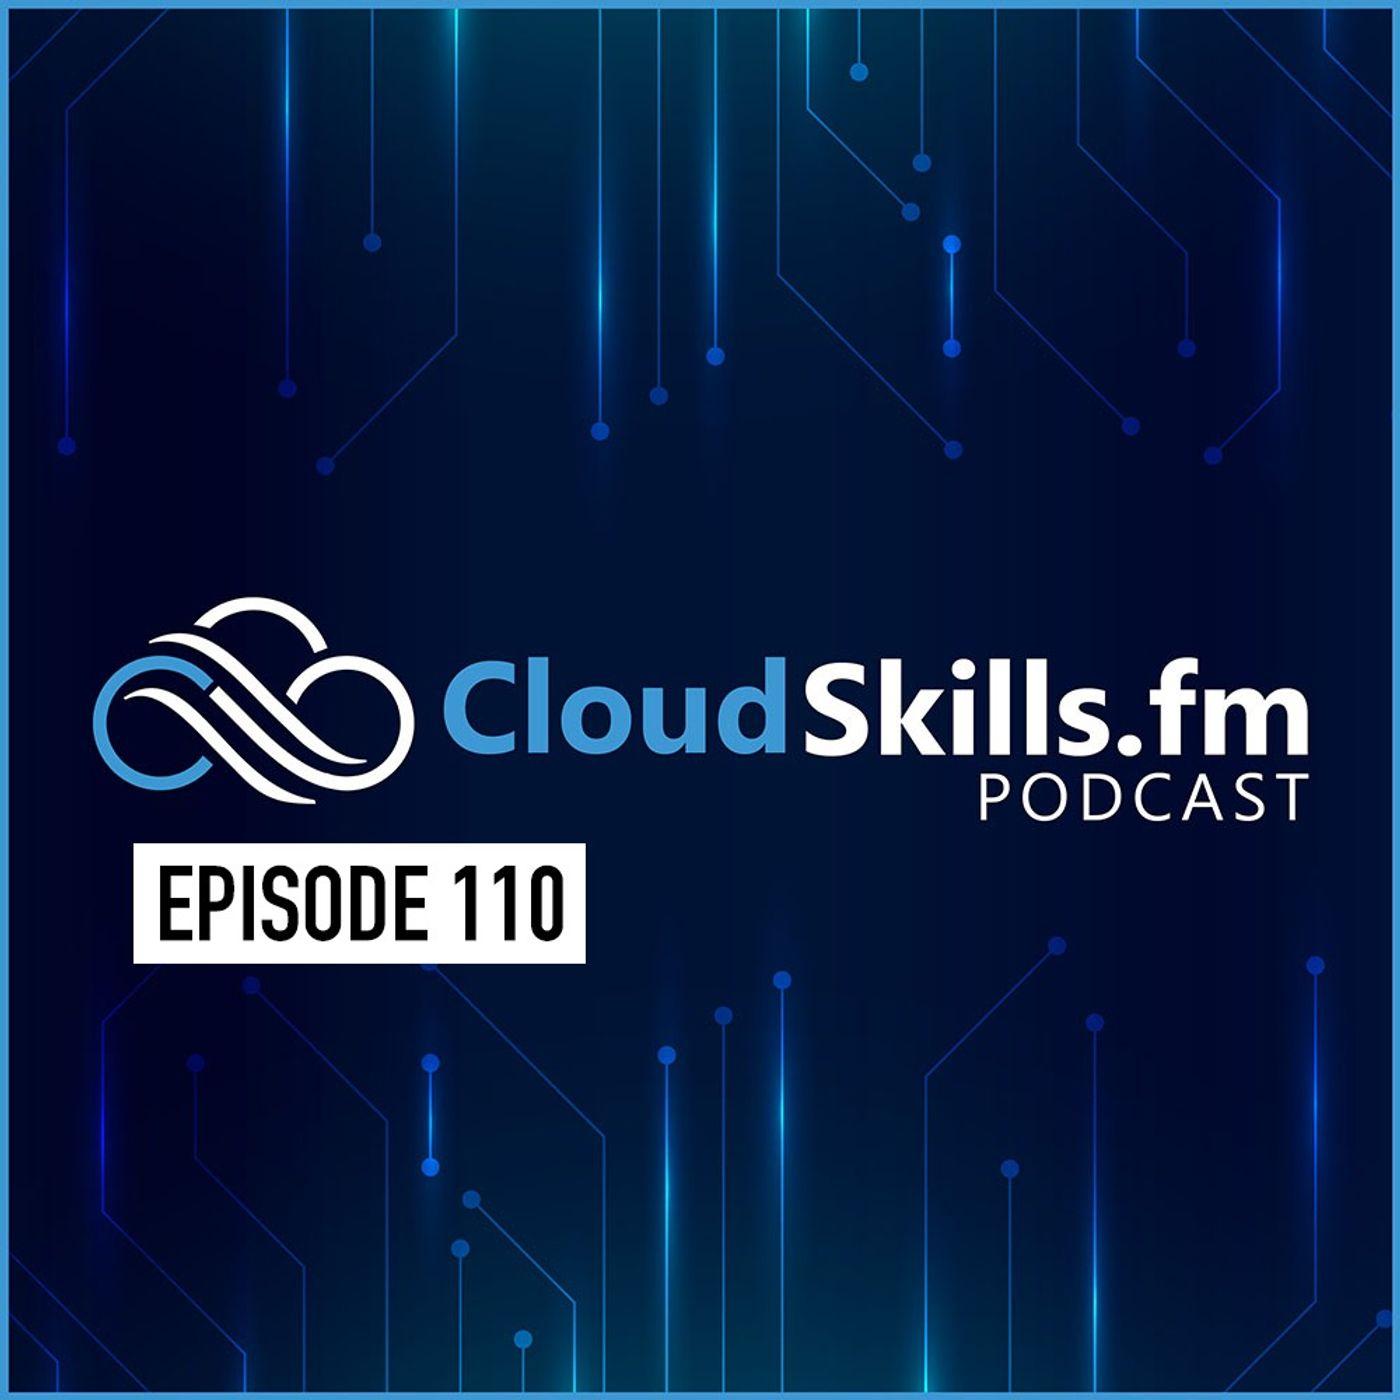 110: Luke Orellana on Working at Microsoft as an SRE, Infrastructure Development, and Terraform